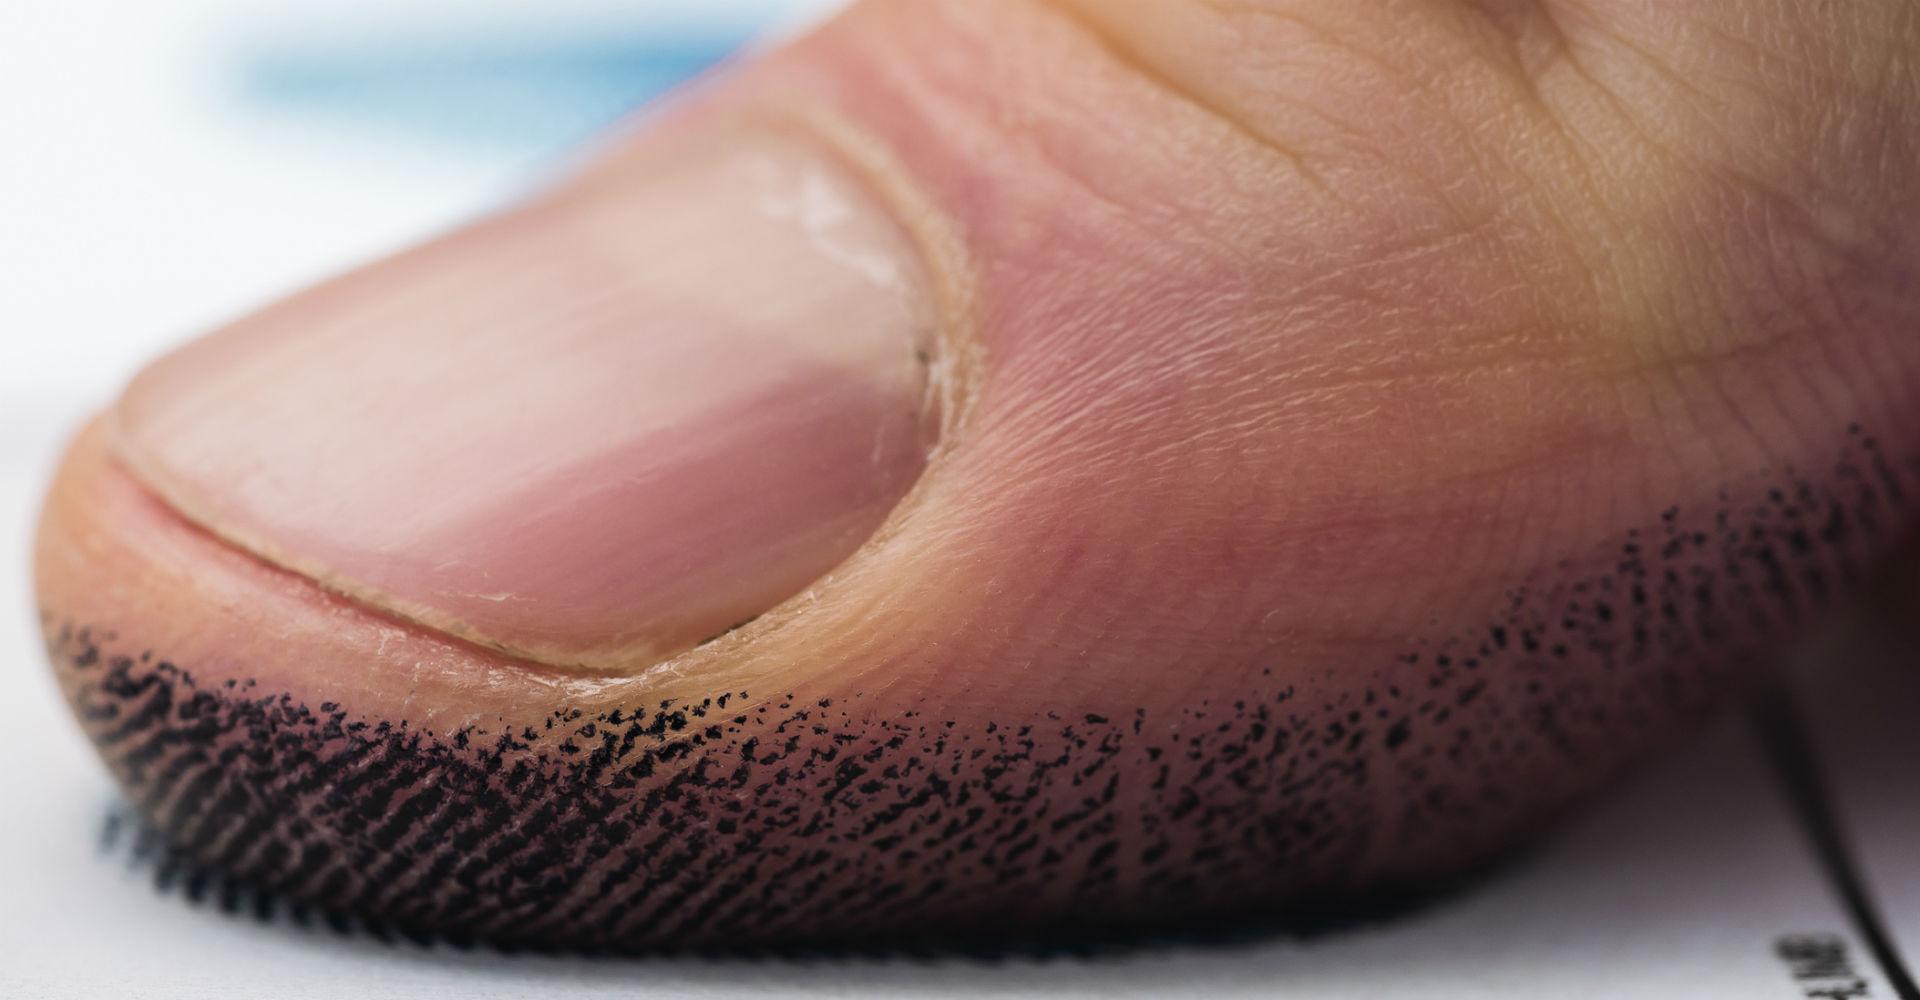 Viele Smartphones lassen sich auch via Fingerabdruck entsperren.